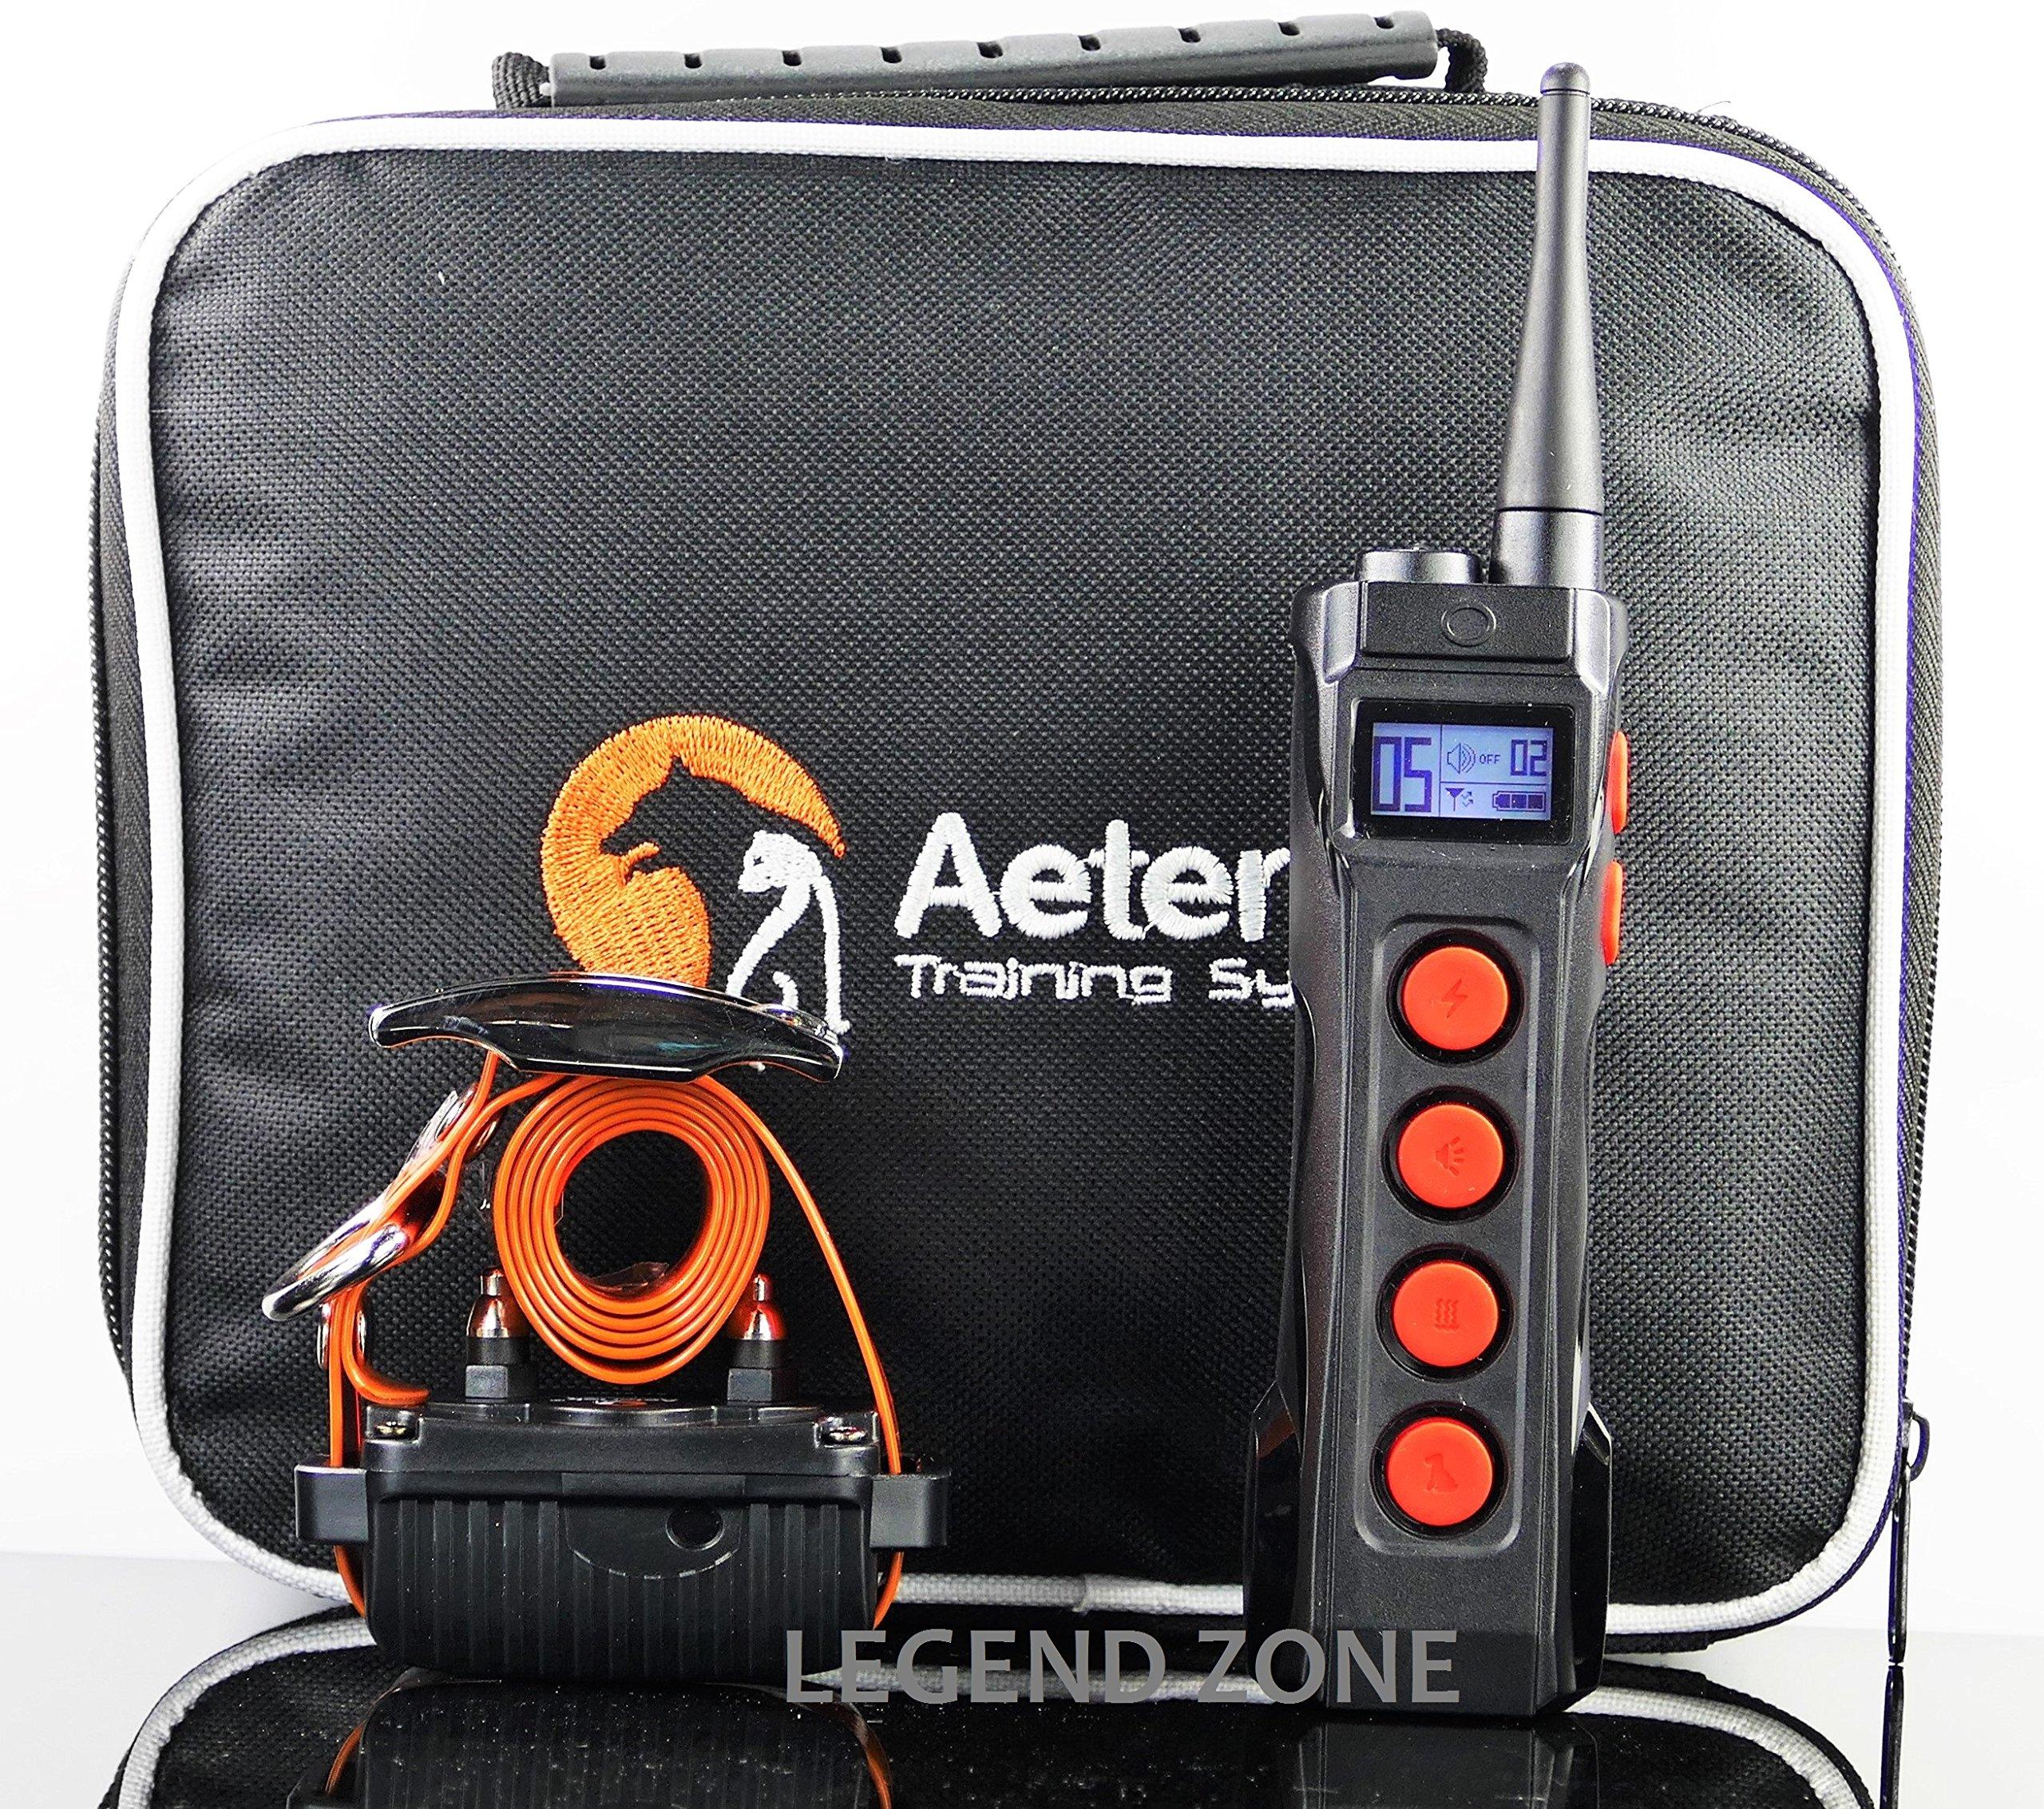 Aetertek 1000 Meter Rechargeable Waterproof Remote Training Collar,Safe Humane Correctional Tone,Vibration,10 Levels of Adjustable Static Stimulation, Auto Anti Bark (One Dog Set) by Aetertek